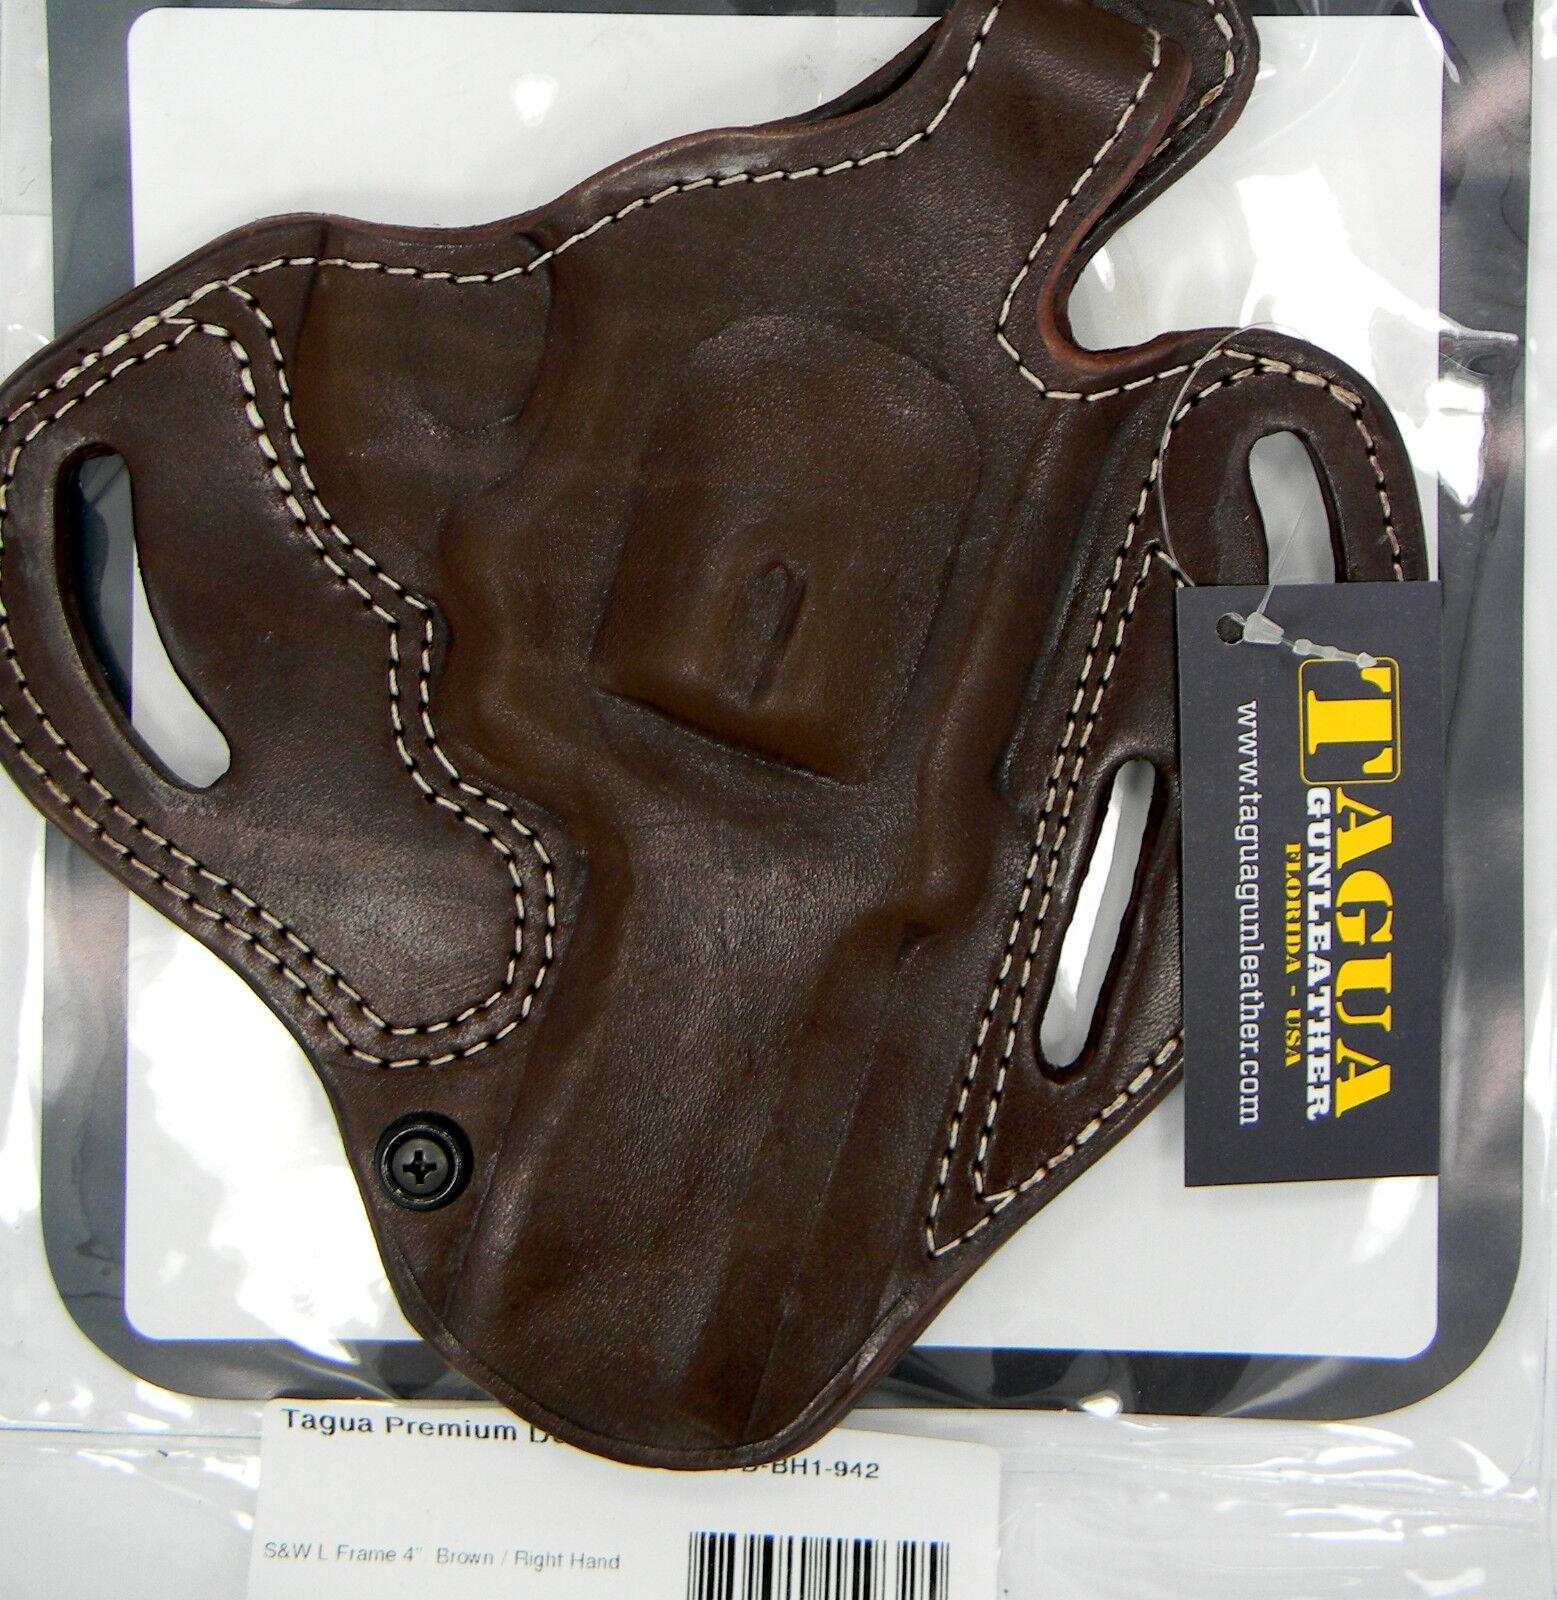 Tagua Premium Brown Leather OWB Thumb Break Belt Holster - S&w L ...